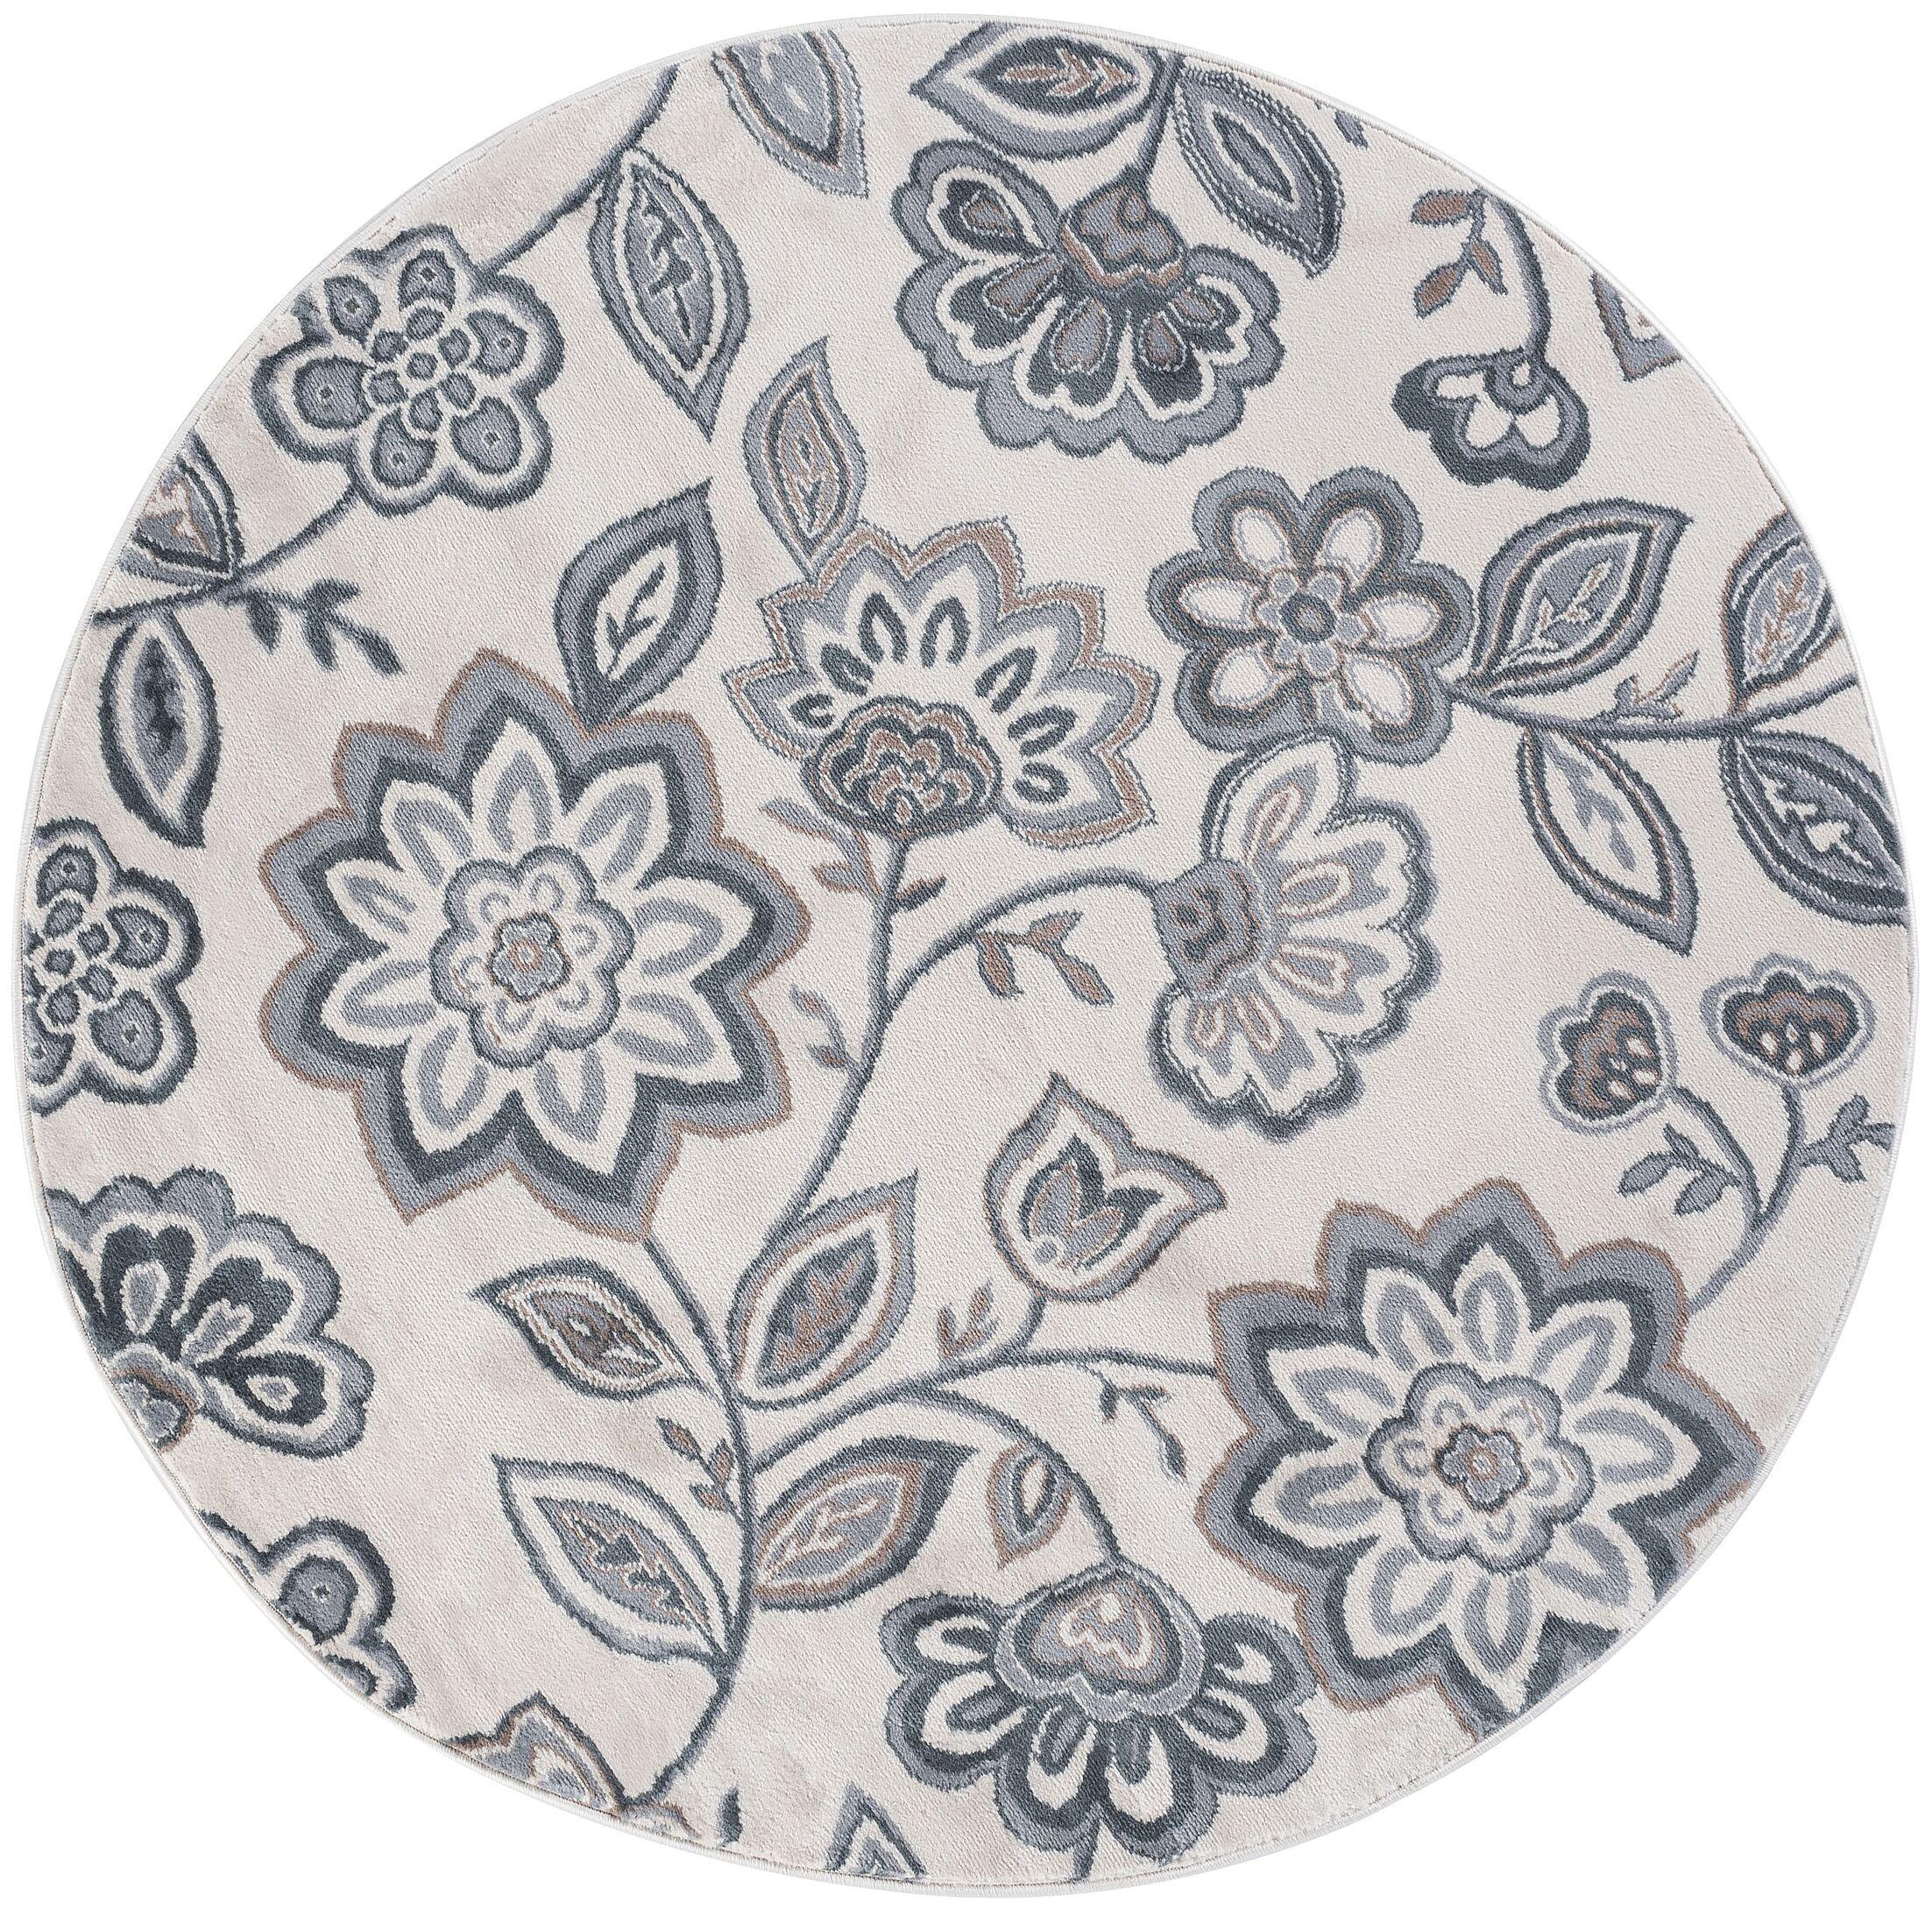 Majoros Modern Floral Cream Area Rug Rug Size: 7'10'' Round